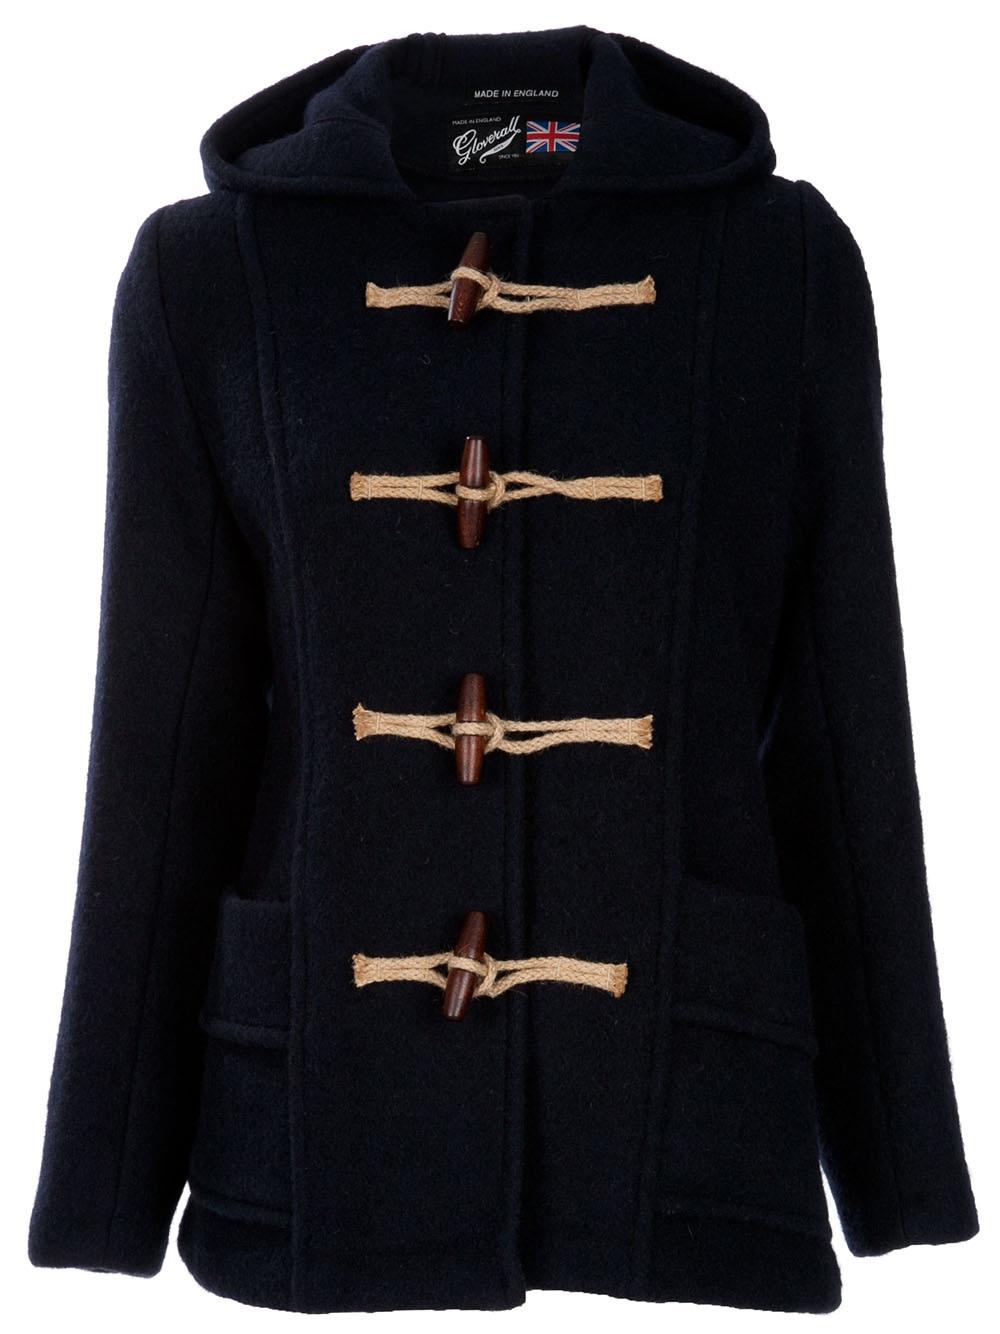 Gloverall Short Duffle Coat in Blue (navy)